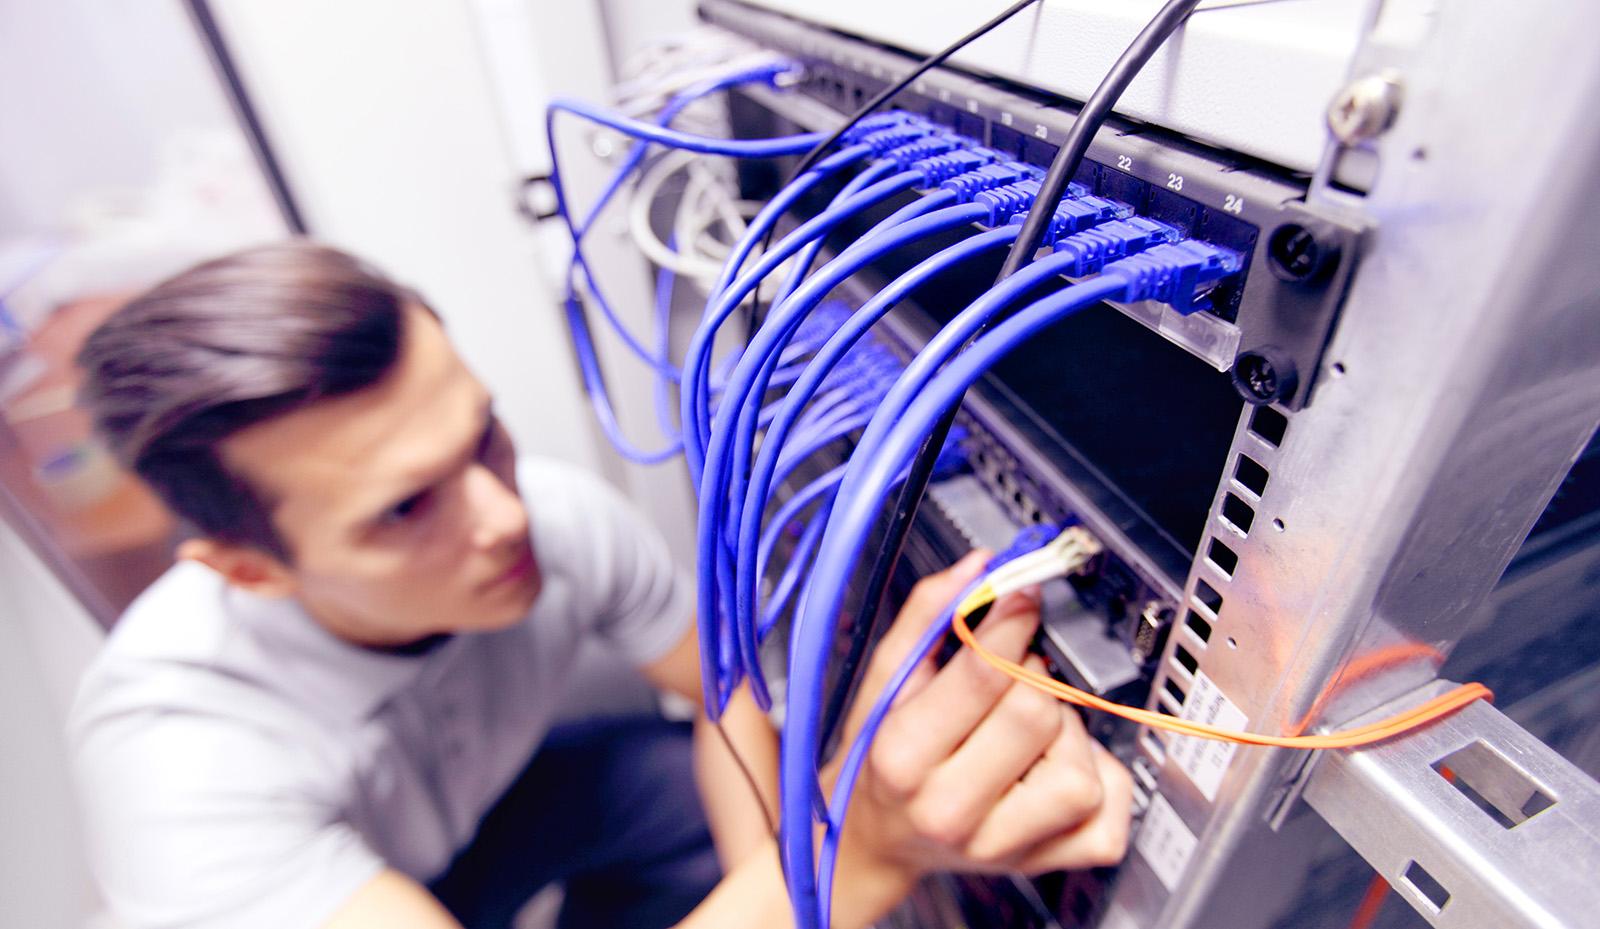 NTS Service-Techniker beim Cable Management im Serverraum